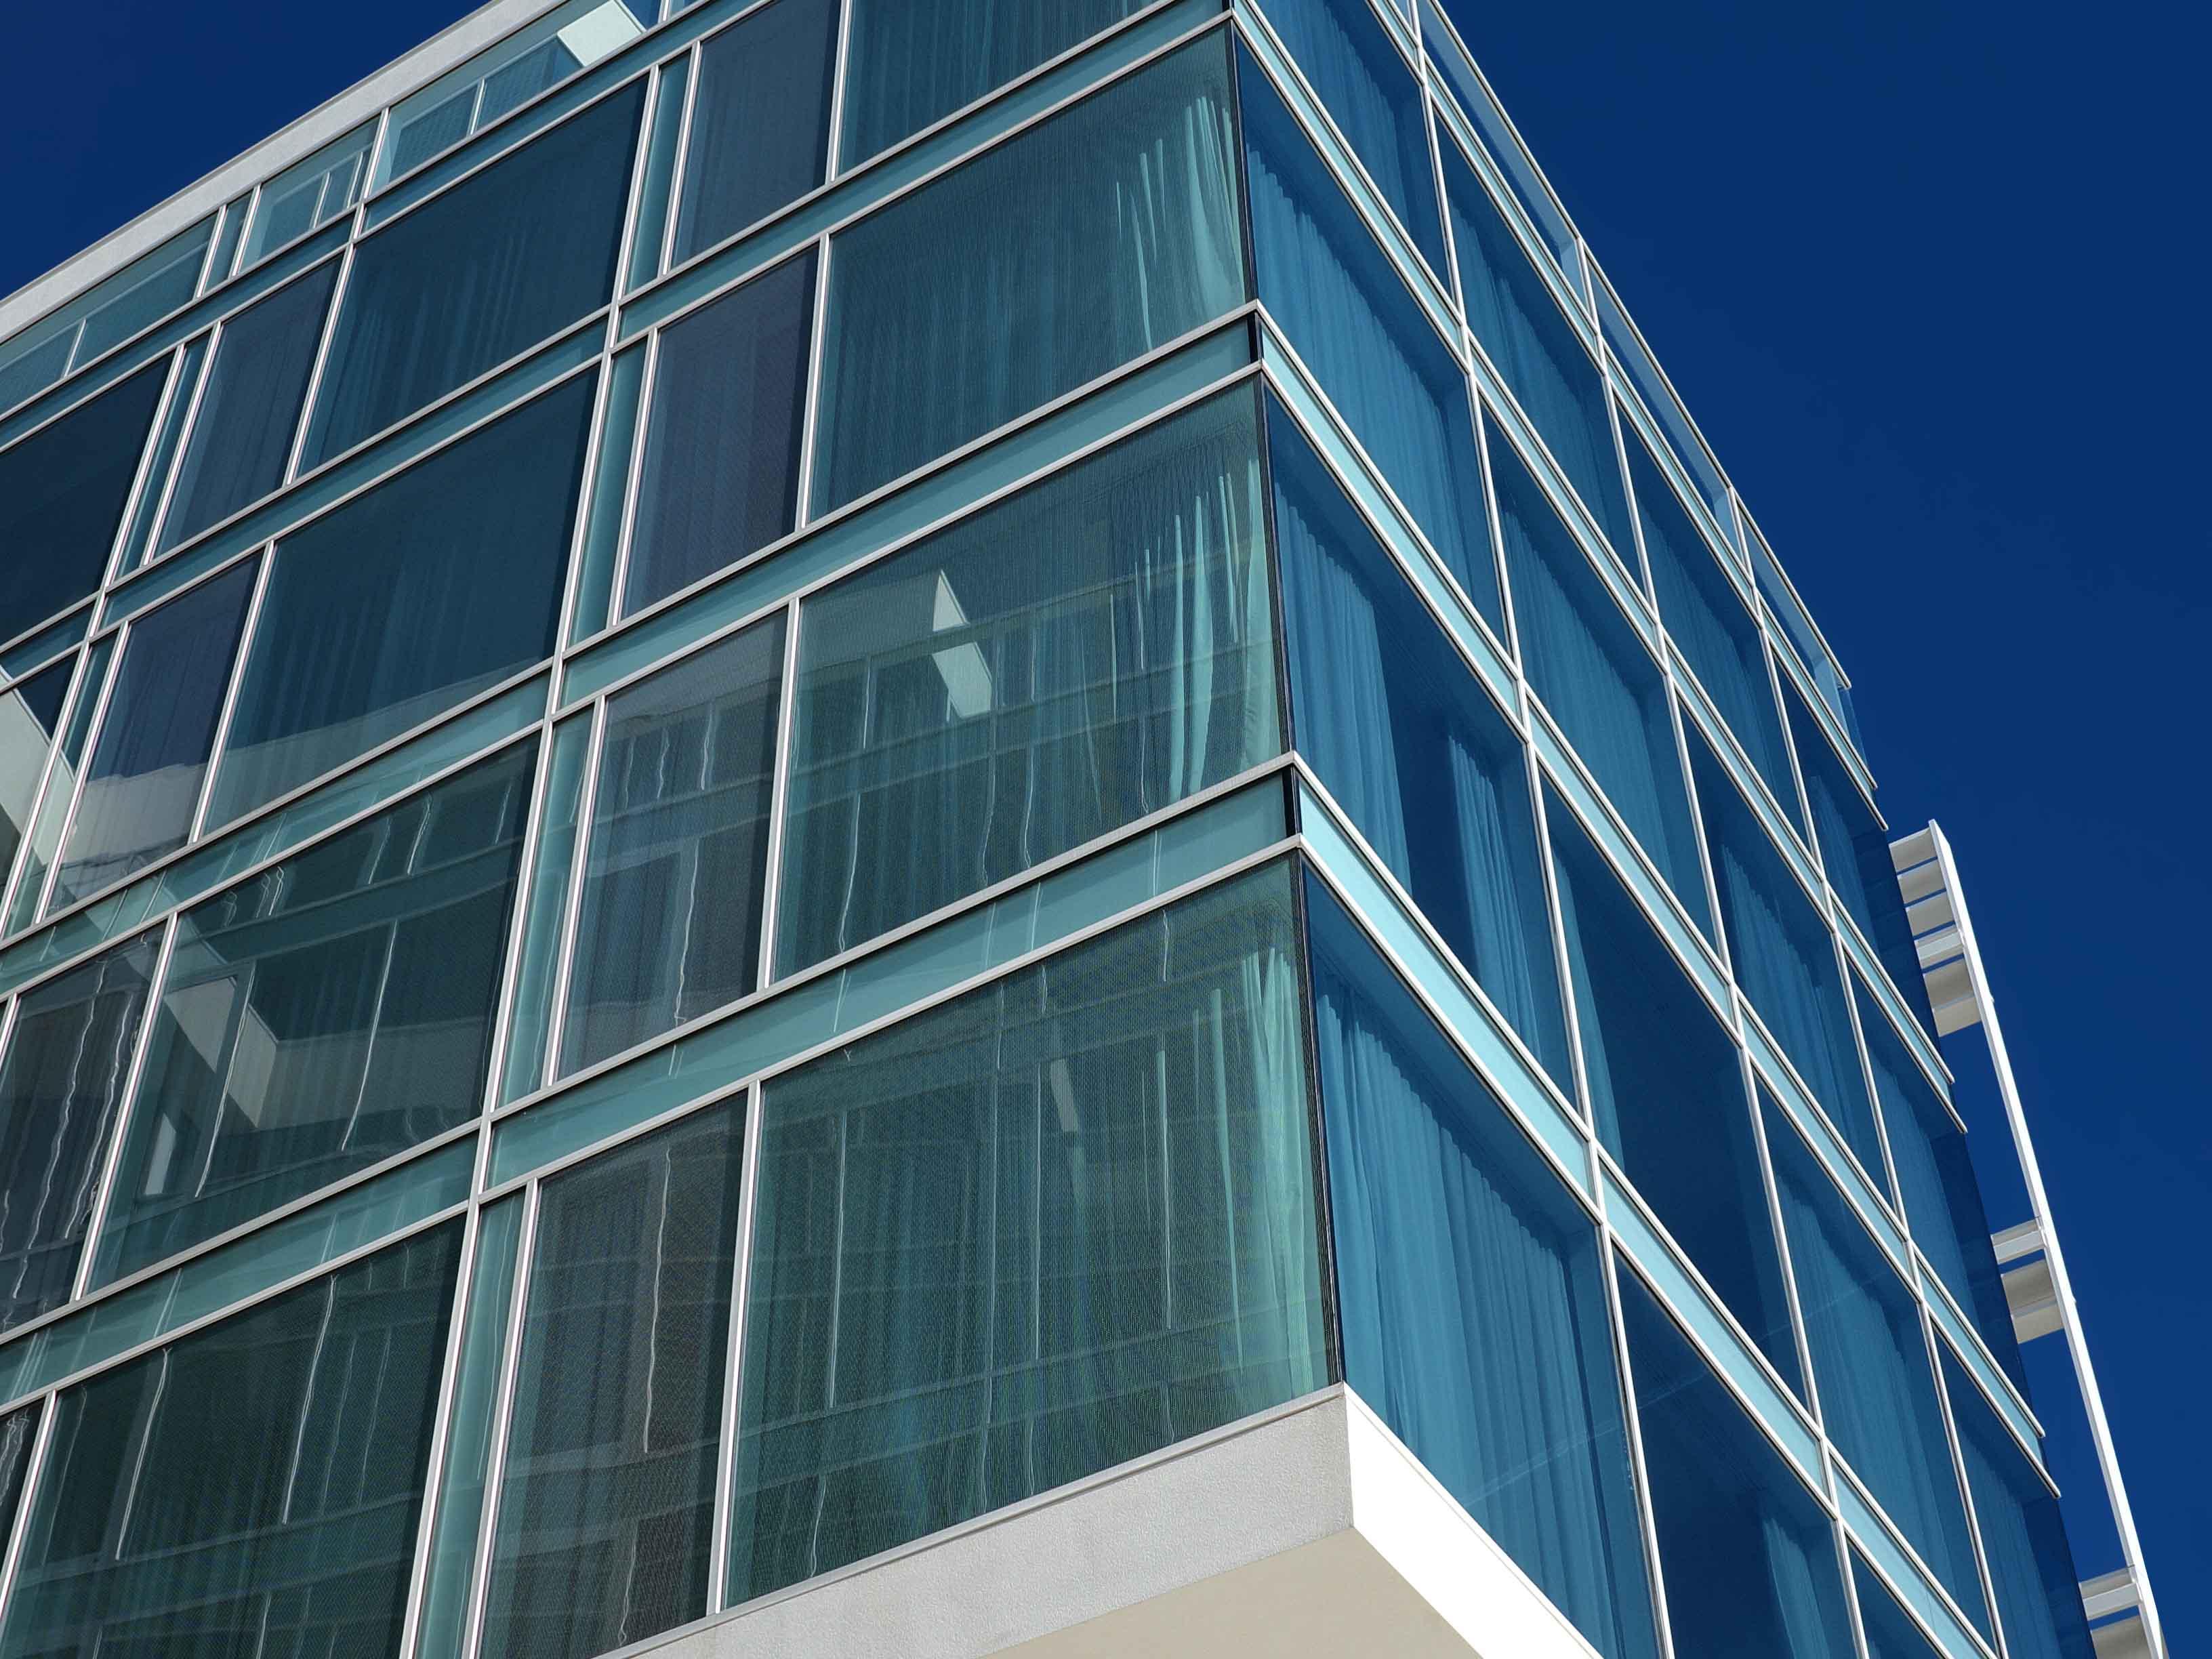 Glass windows selective